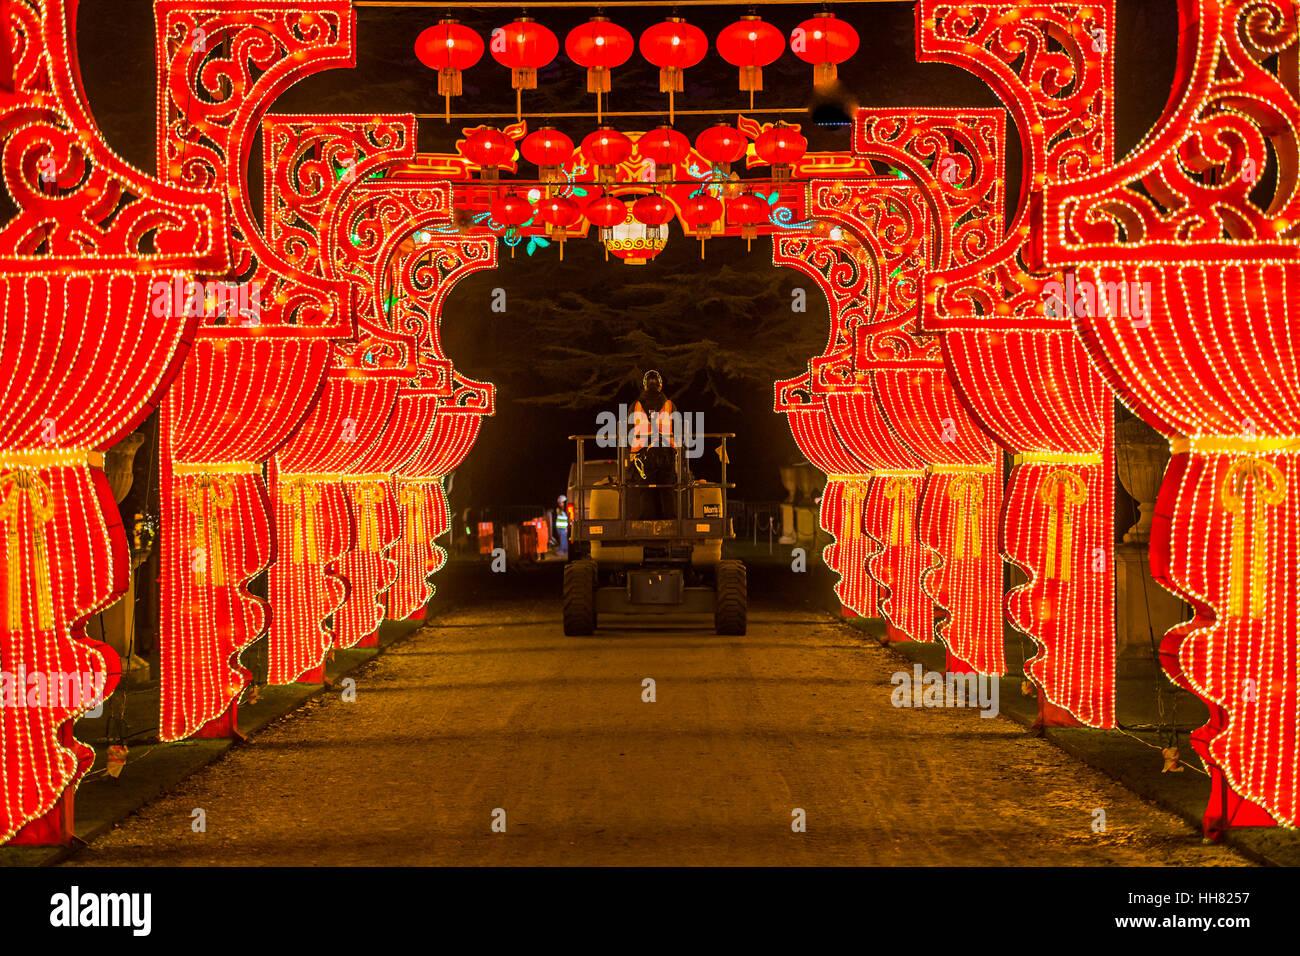 Lantern Magic Stock Photos & Lantern Magic Stock Images - Alamy